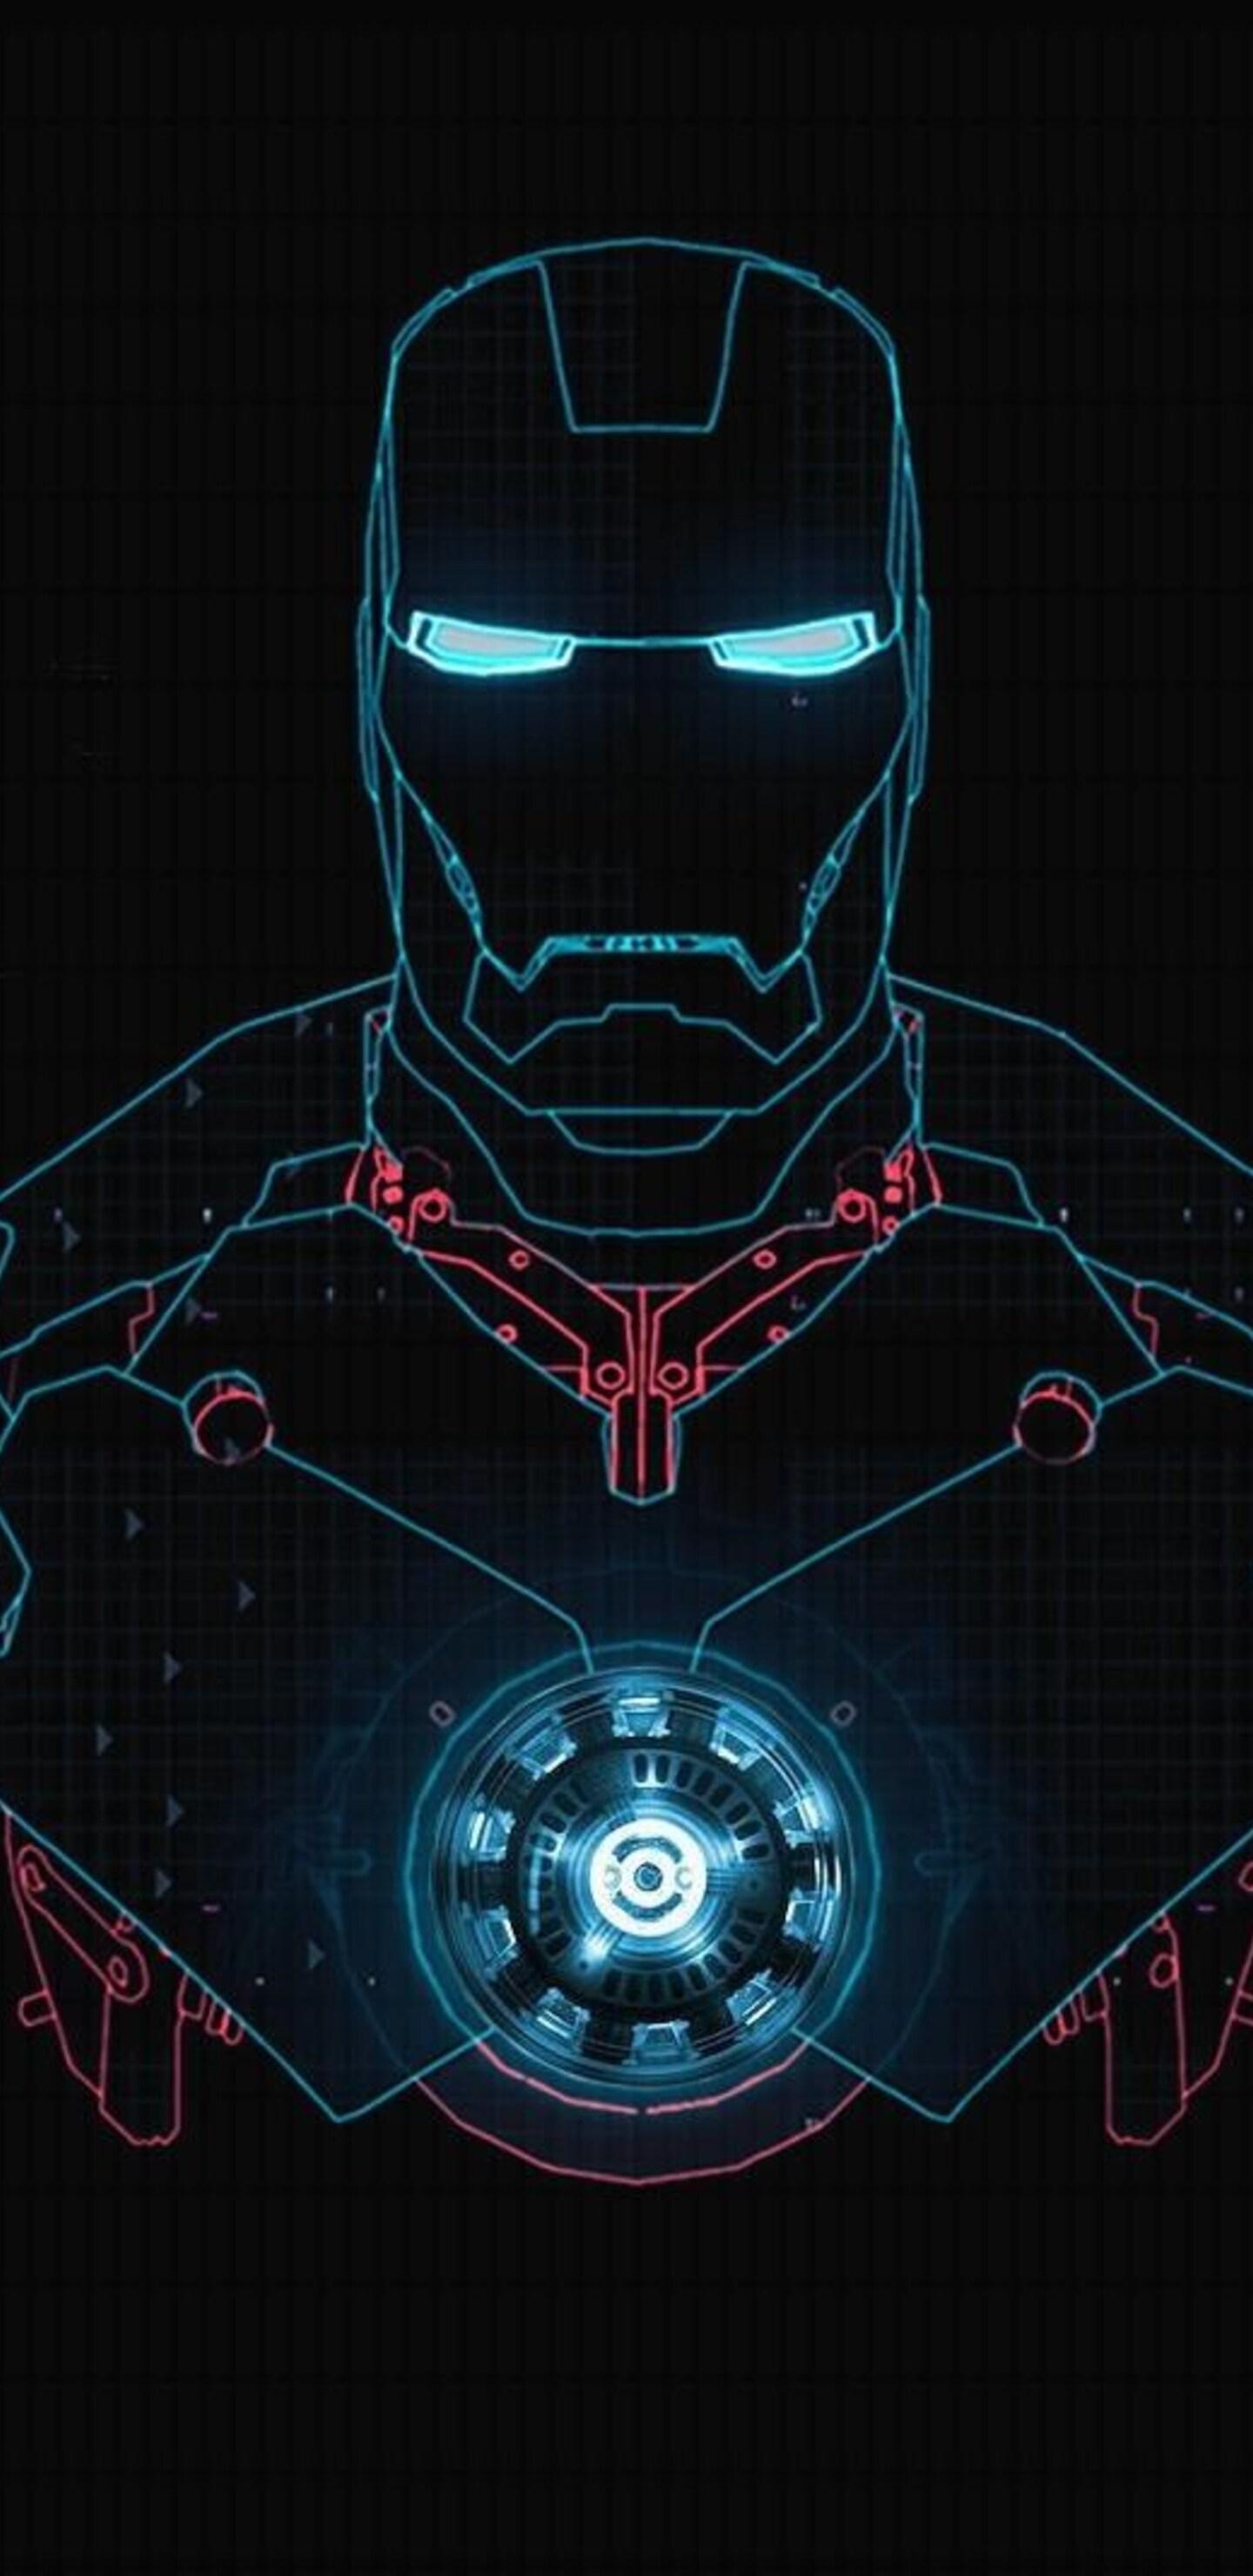 HD Iron Man Wallpaper S8 | Download Kumpulan Wallpaper Drag